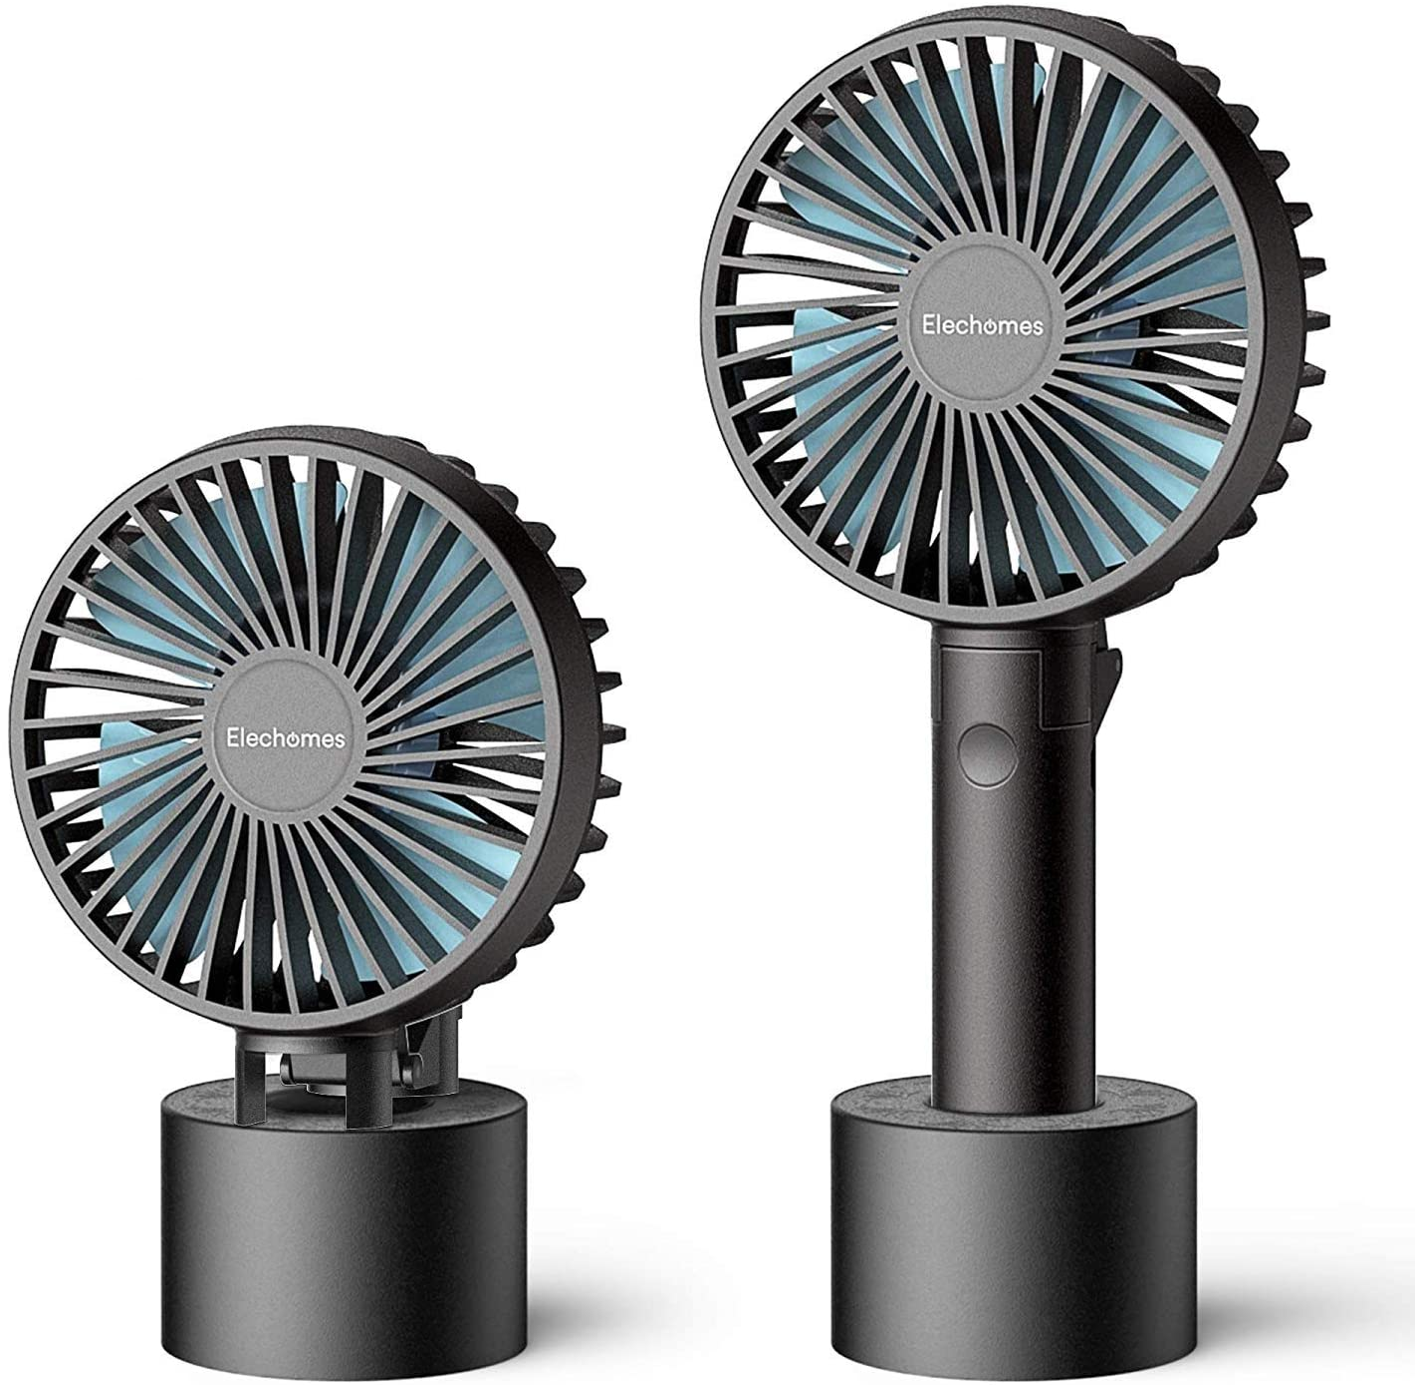 ELECHOMES 2 Pack Mini Ventilador de Mano USB Portátil, ventiladore de Escritorio o Mesa, Batería Recargable Ideal para Viajes, Ordenadores portátiles, acamapadas: Amazon.es: Electrónica